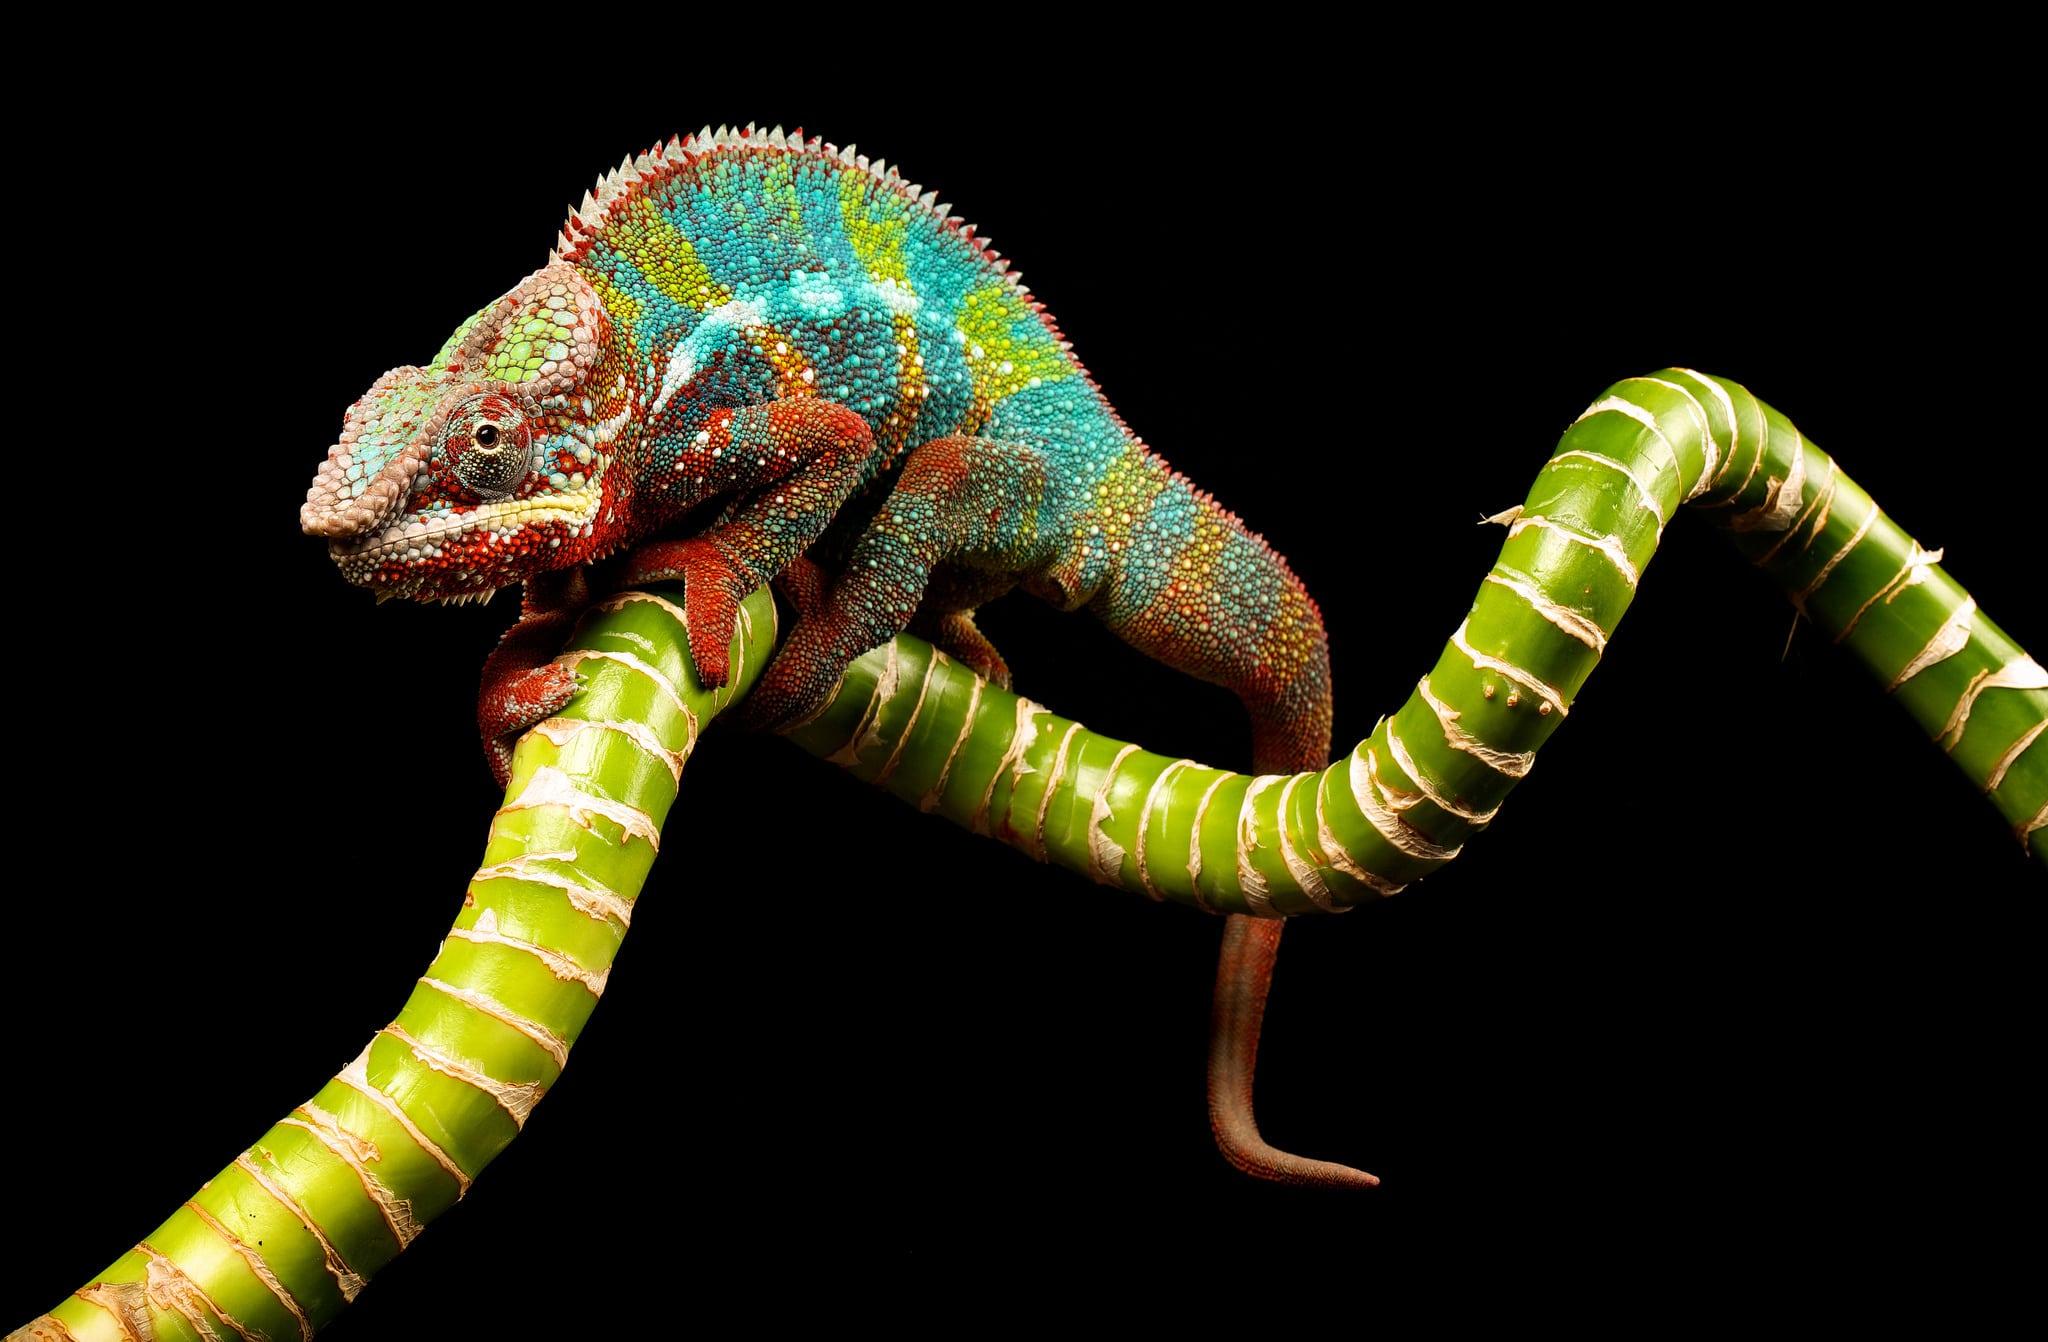 Colors Colorful Branch Lizard Reptile 2048x1342